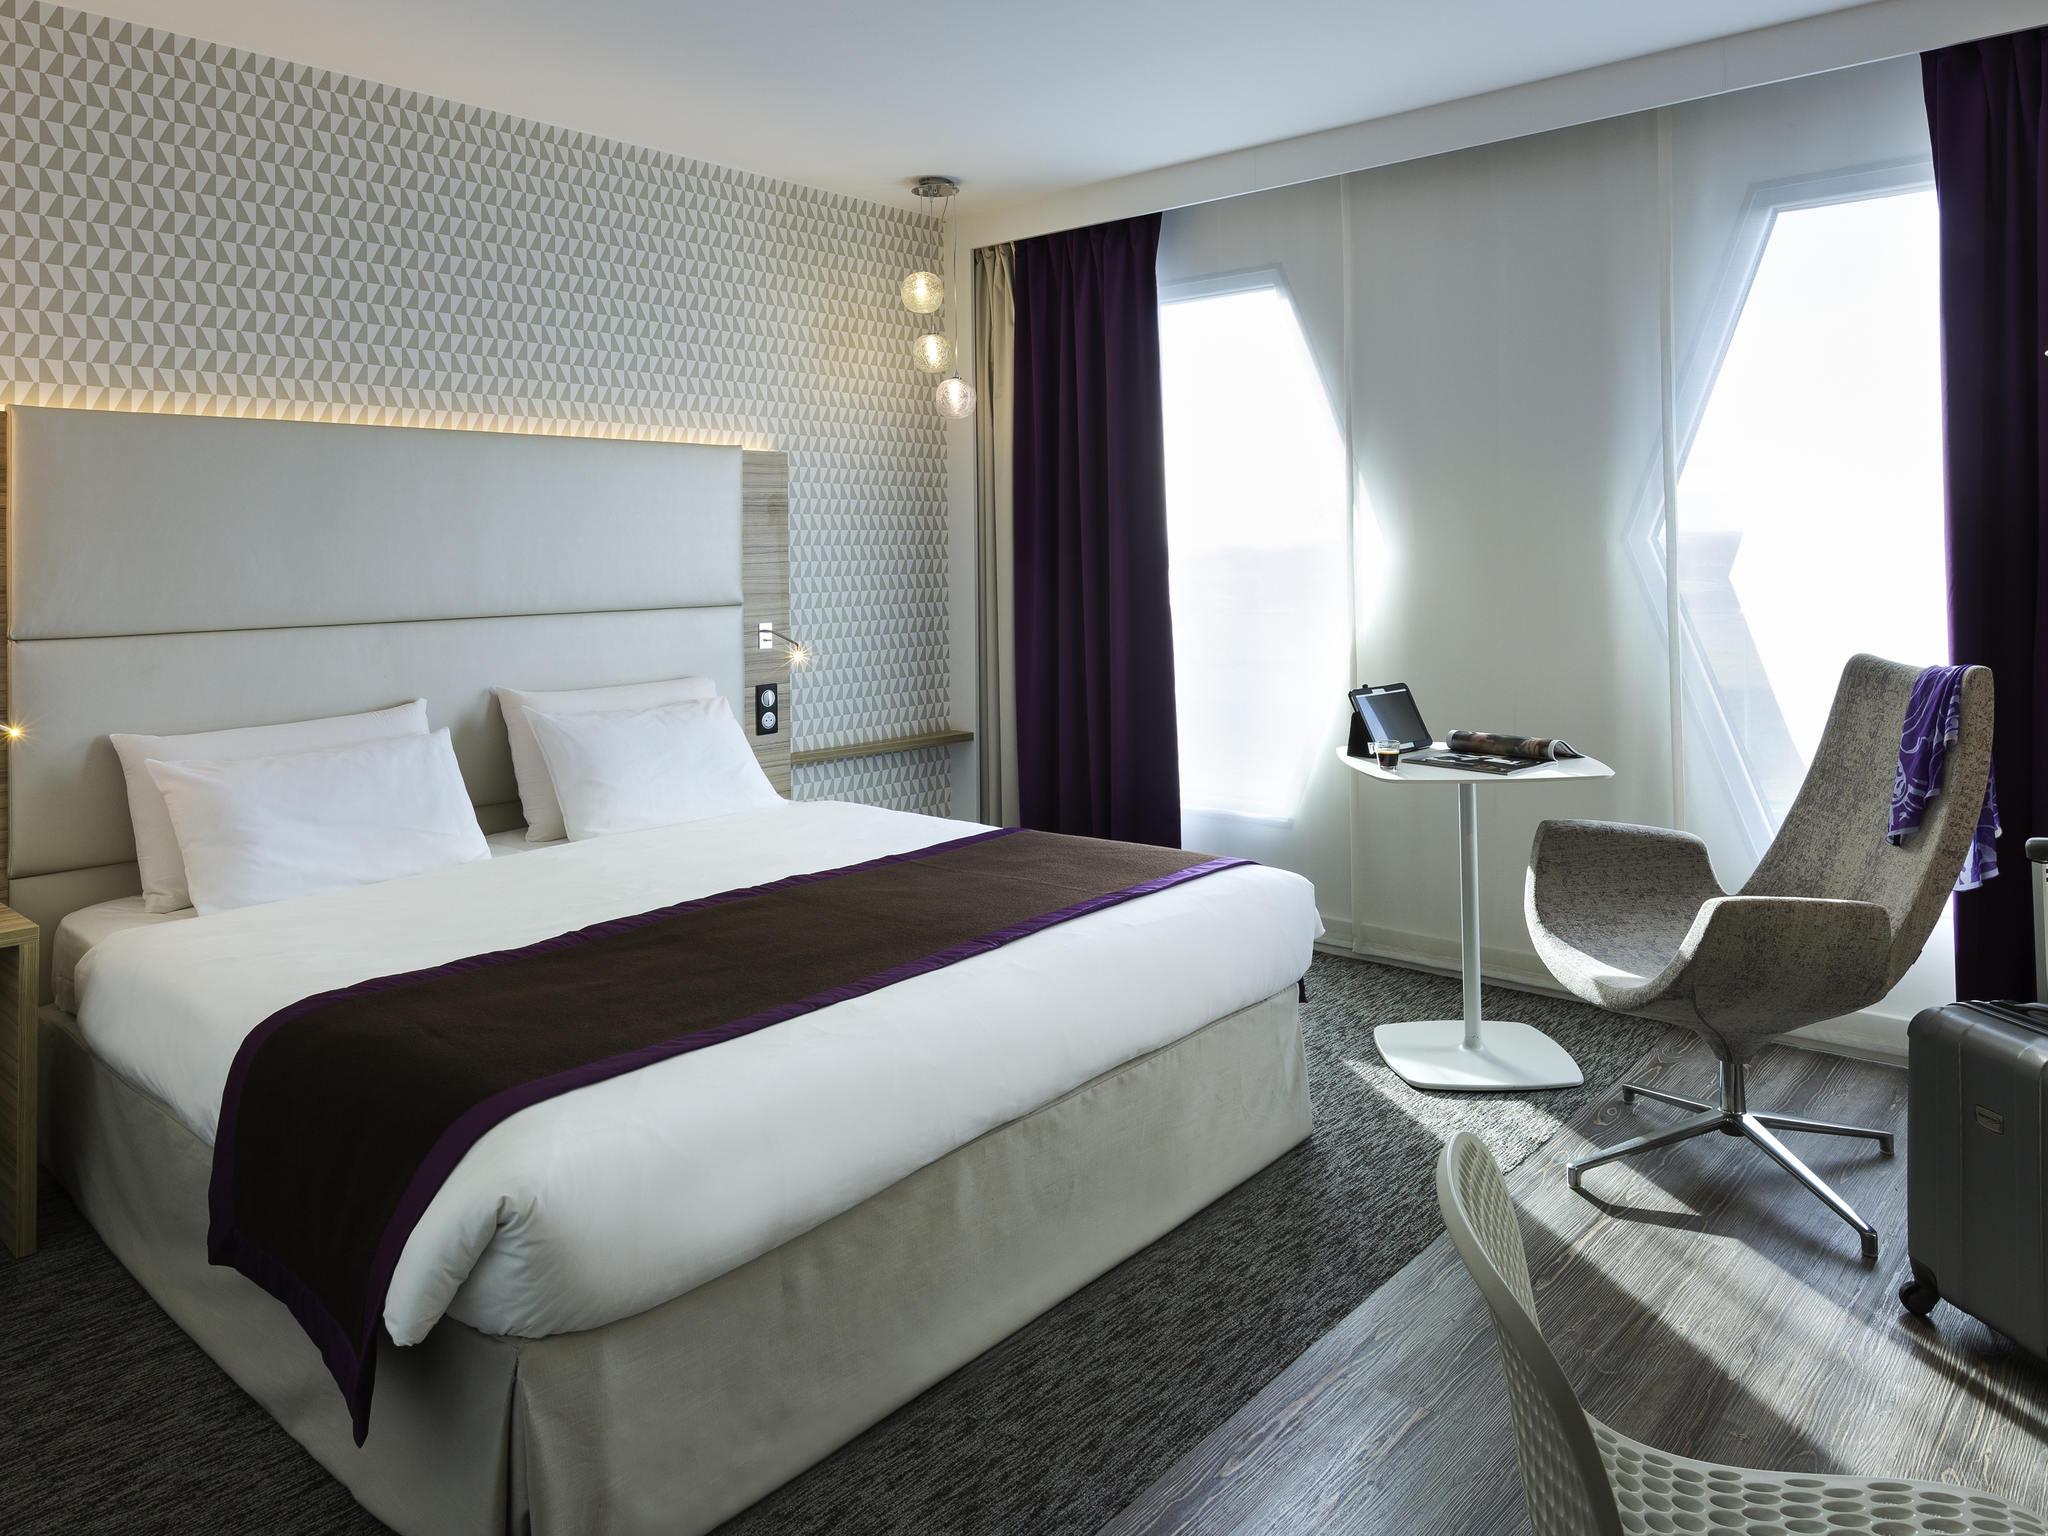 Hotel – Hotel Mercure Paris Orly Rungis Aéroport